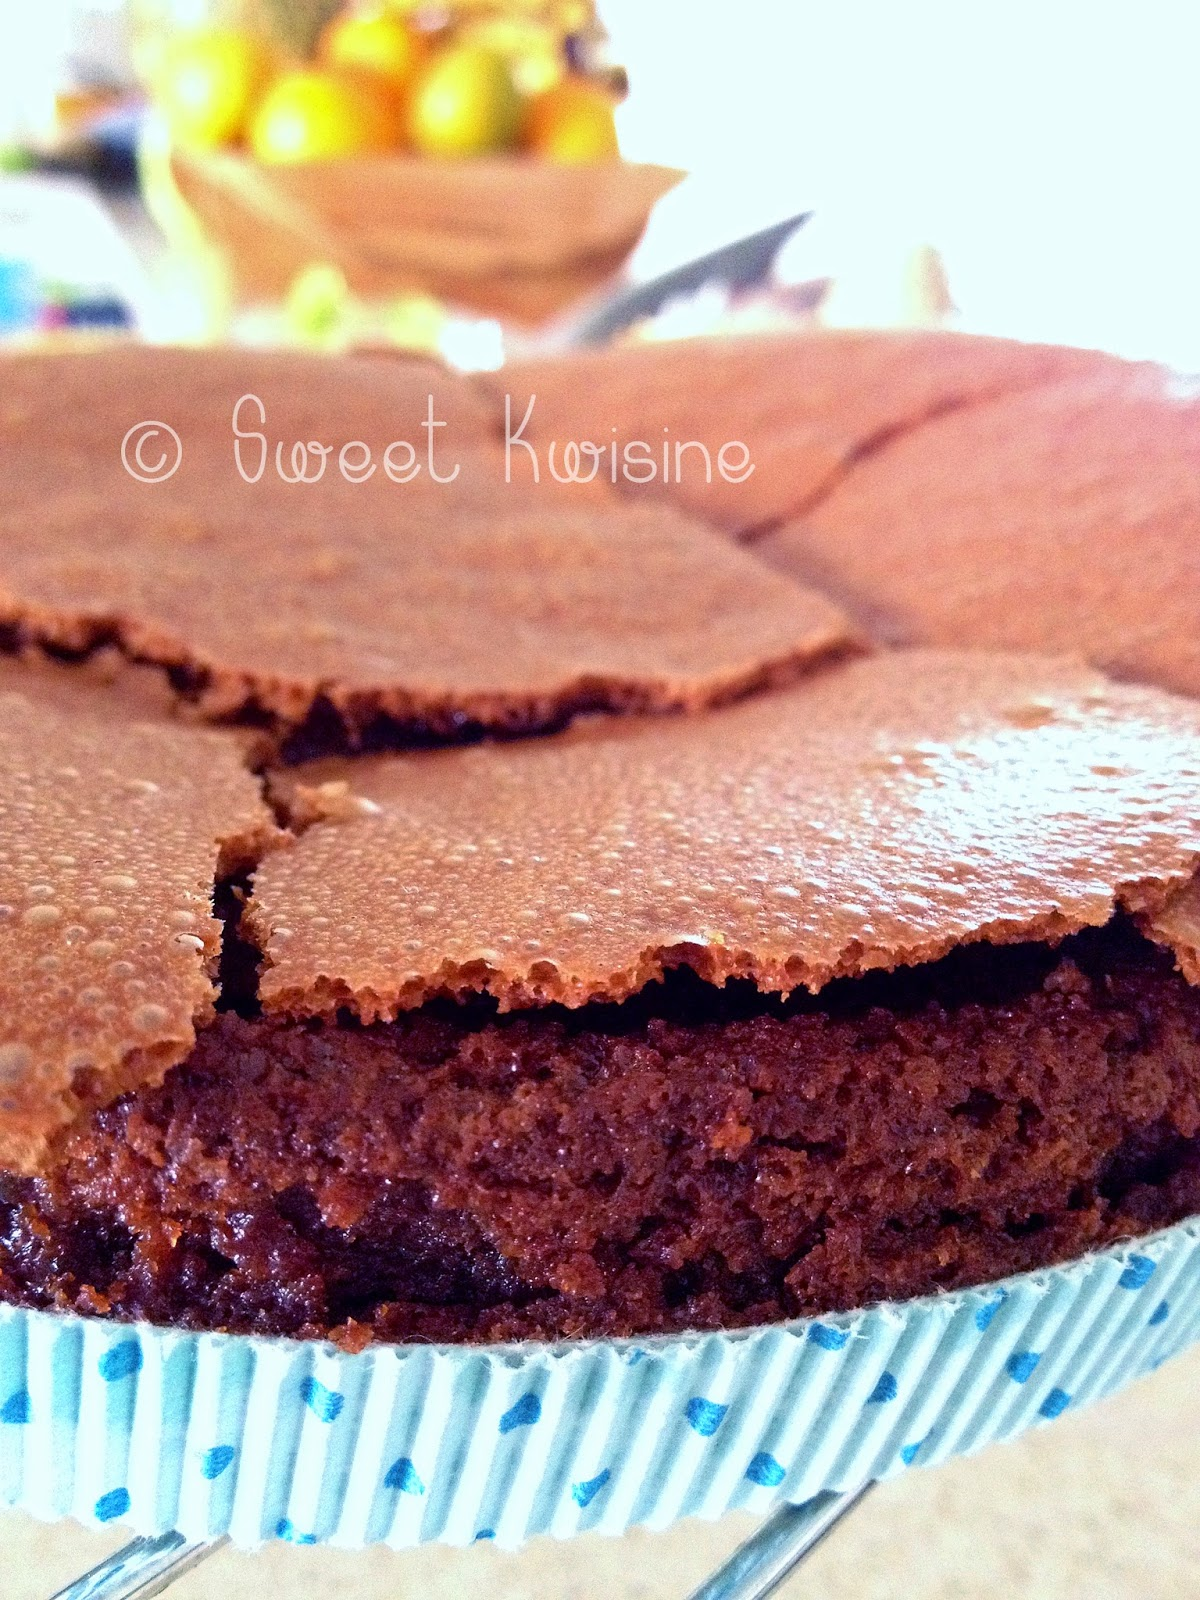 Sweet Kwisine, chocolat, moelleux, caramel, beurre demi-sel, cuisine de bernard